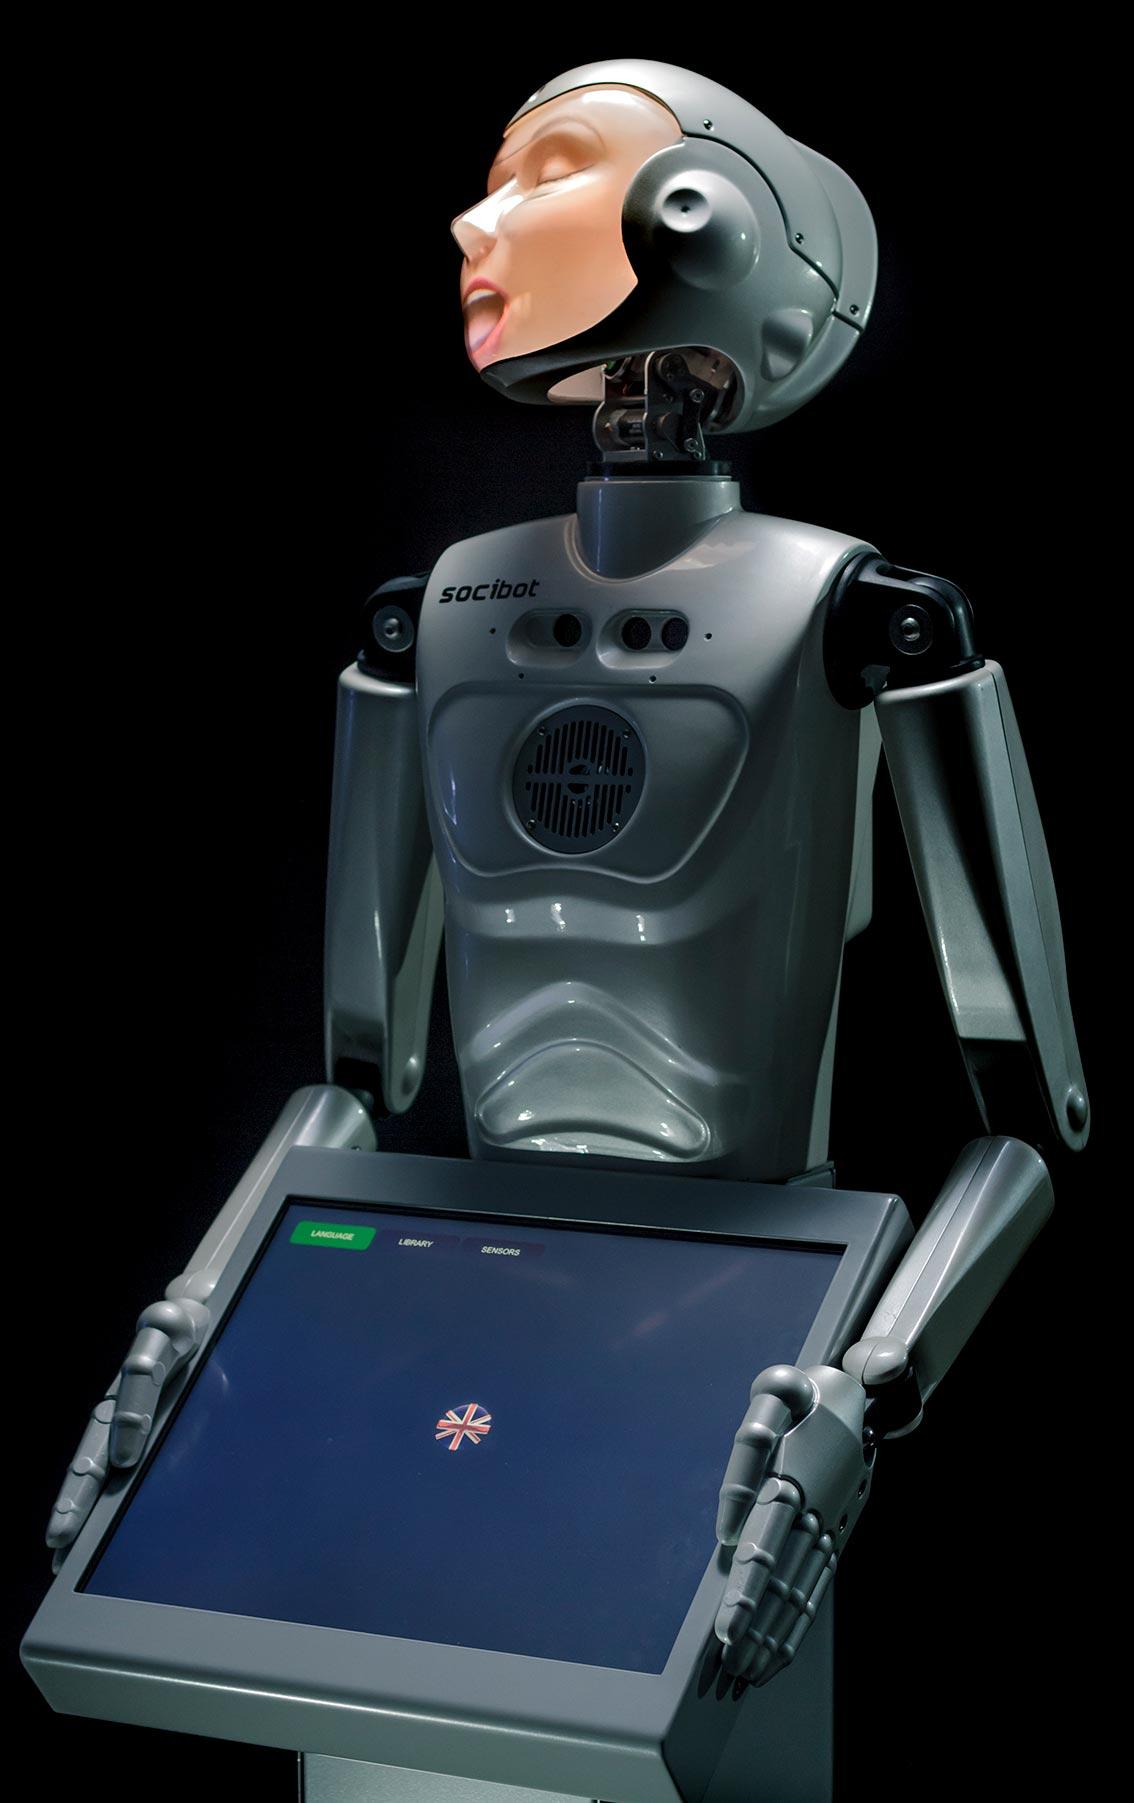 Semi Humanoid Robot SociBot Kiodk White Female Singing Engineered Arts